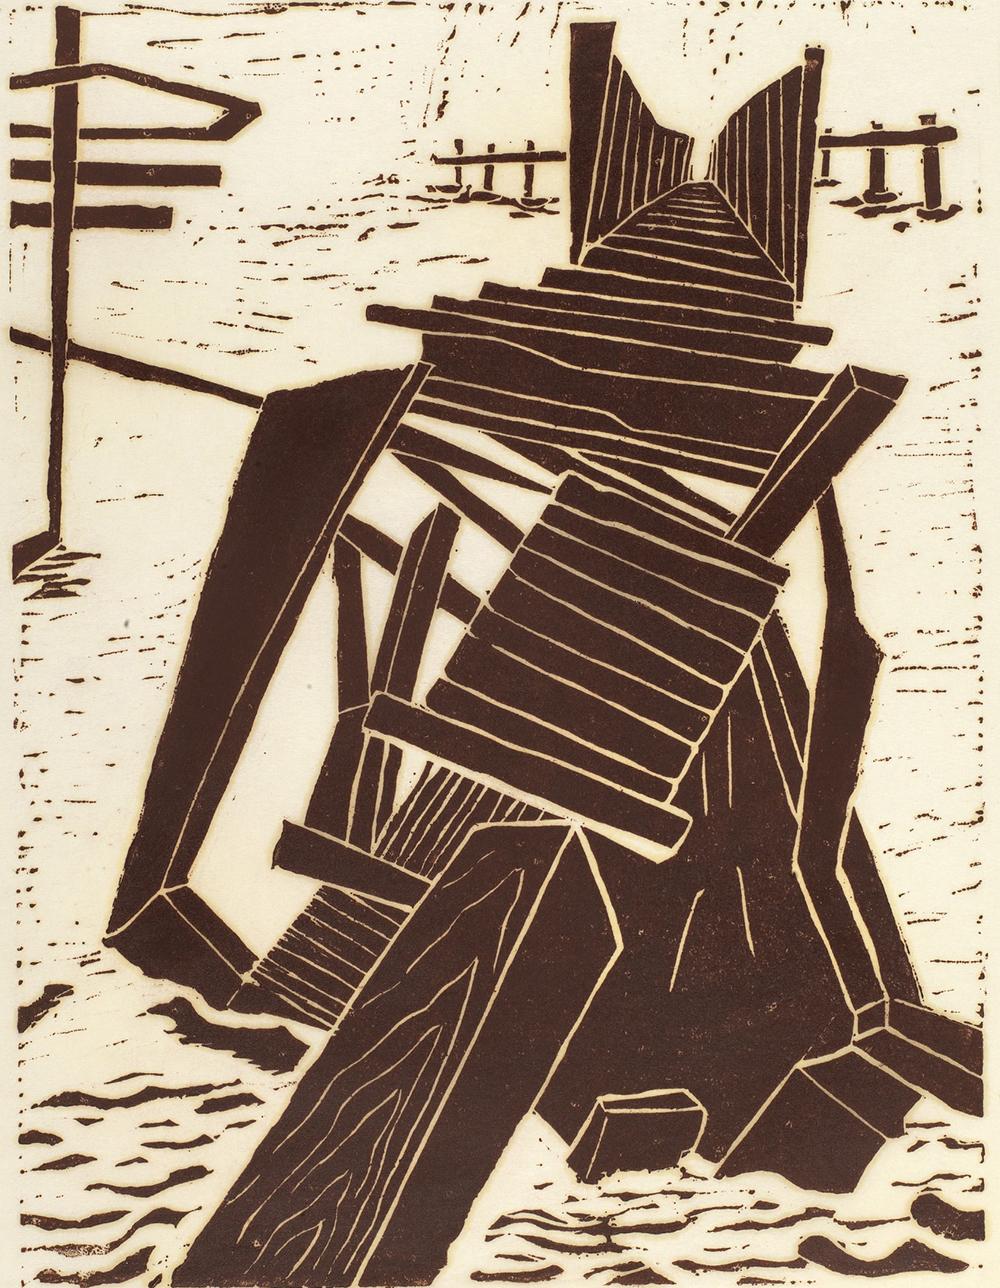 Hurricane's End, by Frank McClure, twentieth century.